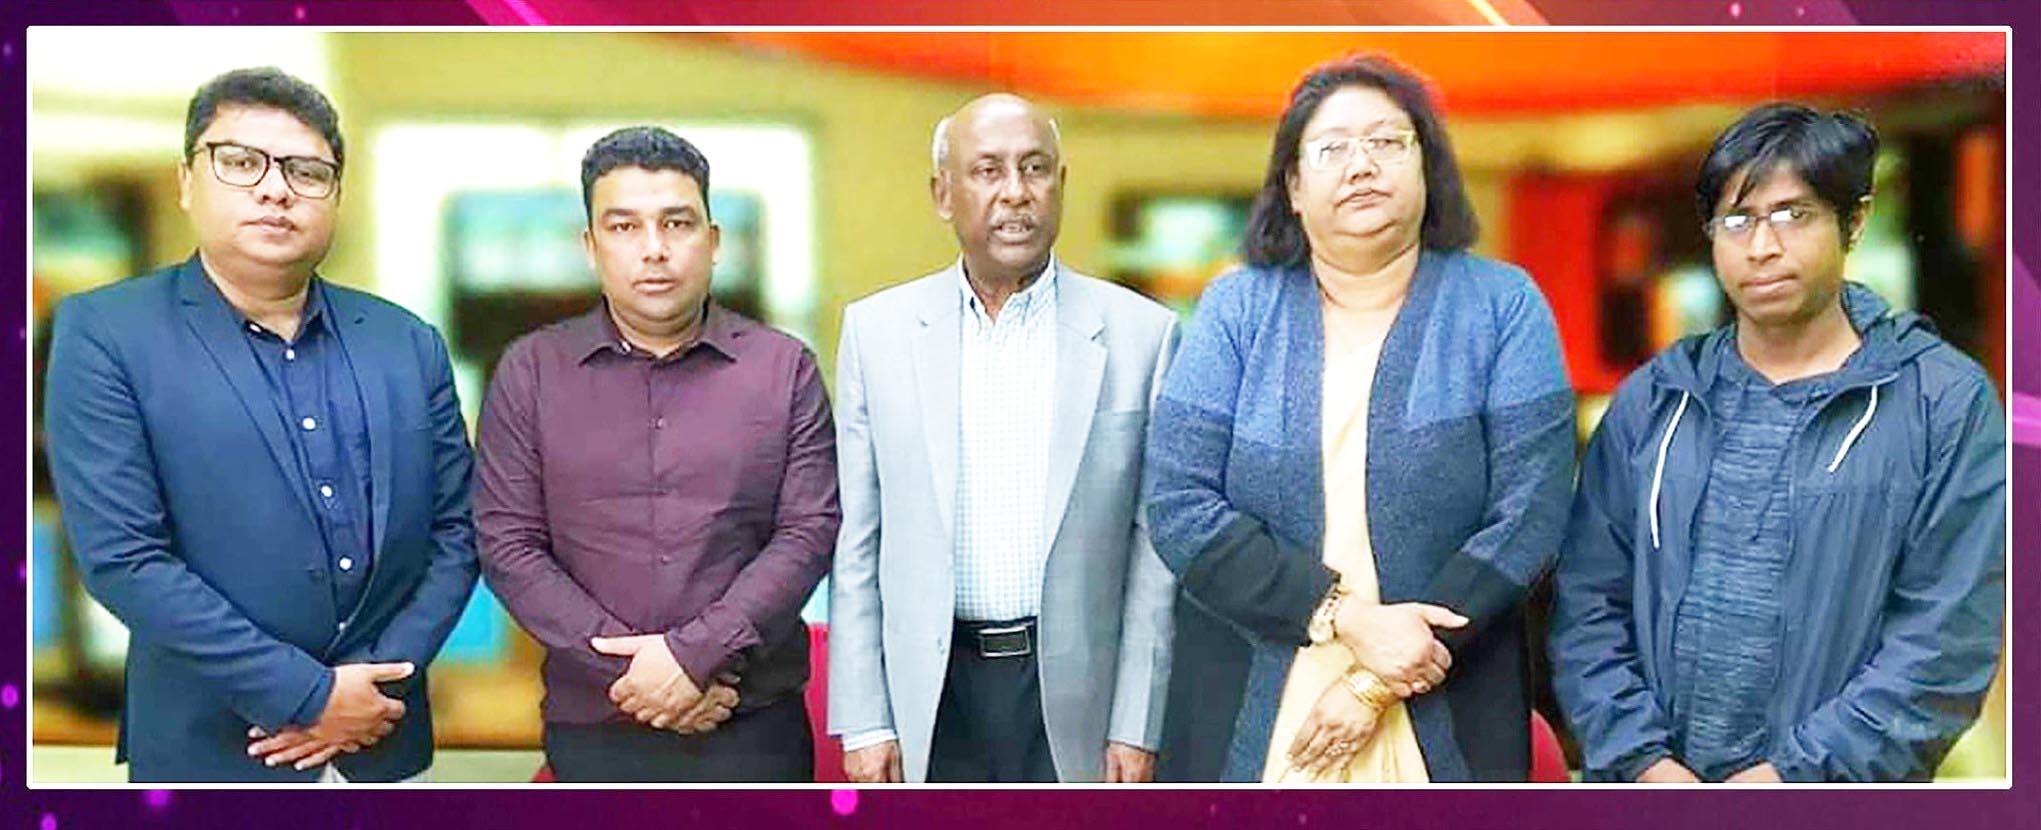 Mr-mp-ashraf-ali-khan-khoshru-with-eurobangla-tv-team